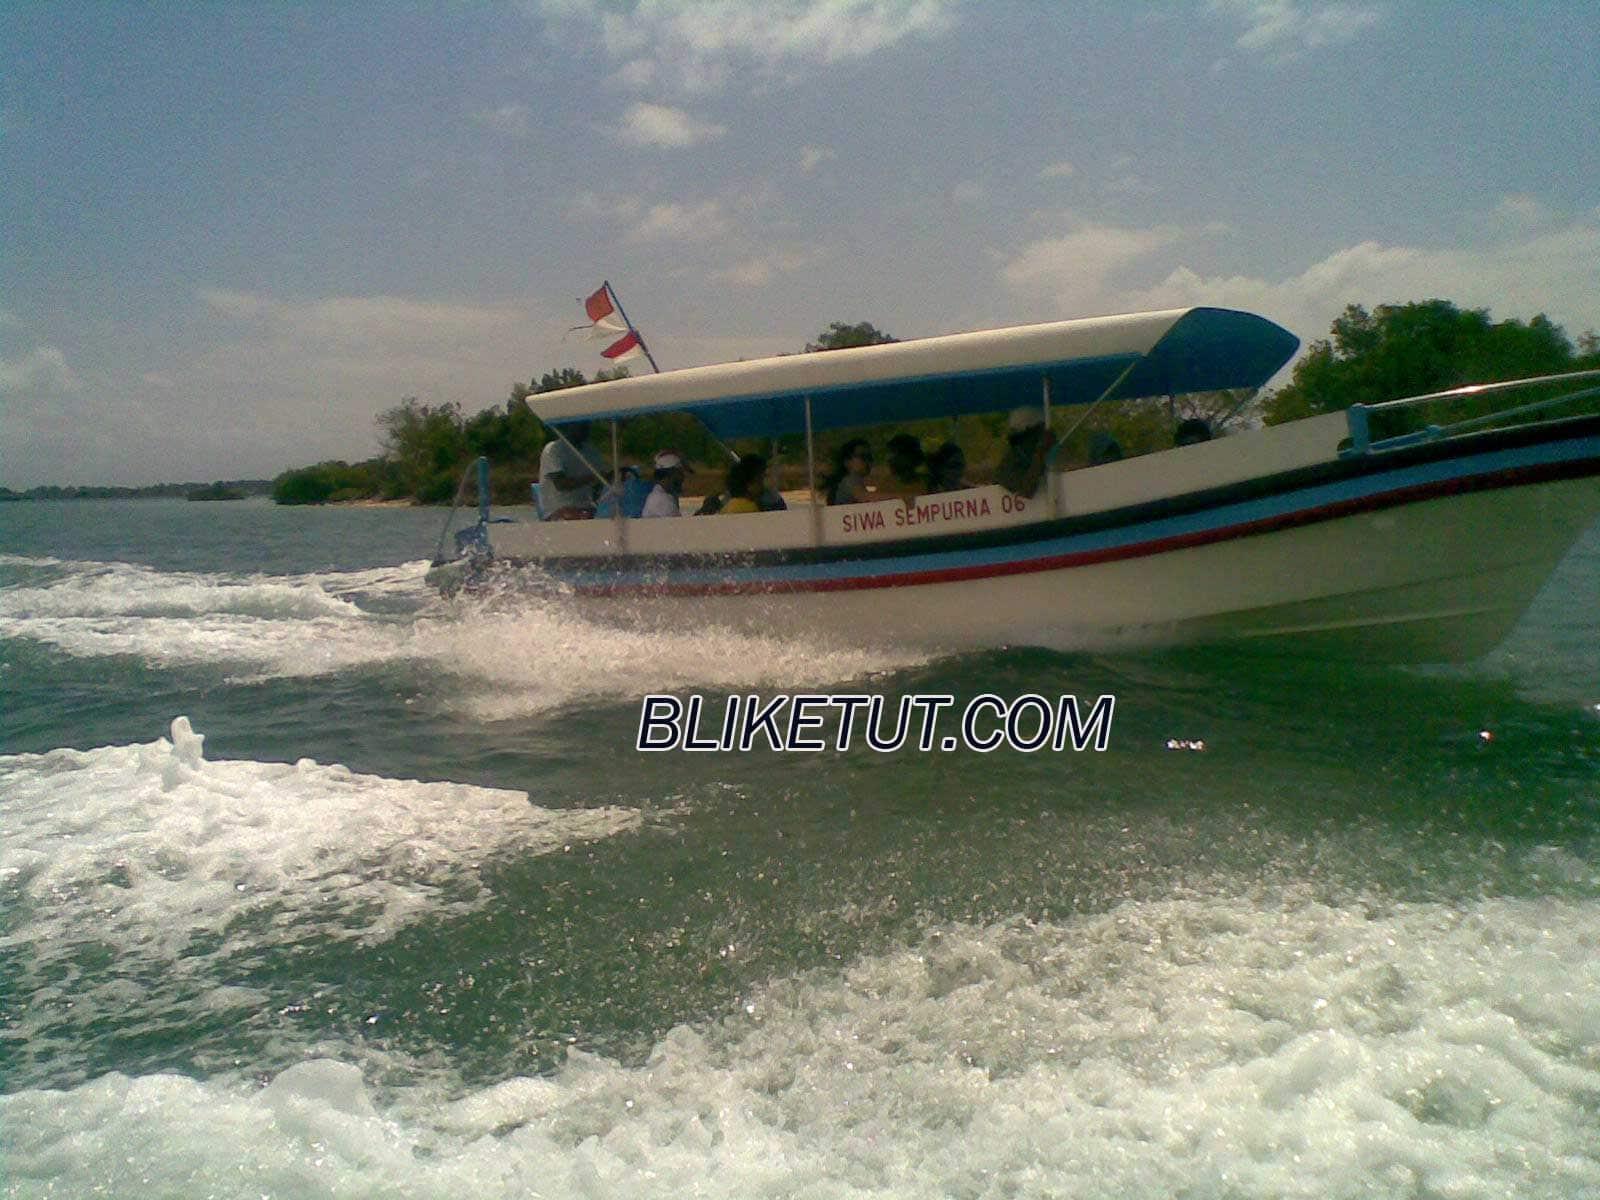 Wisata Pulau Penyu (Glass Bottom Boat + Turtle Island)